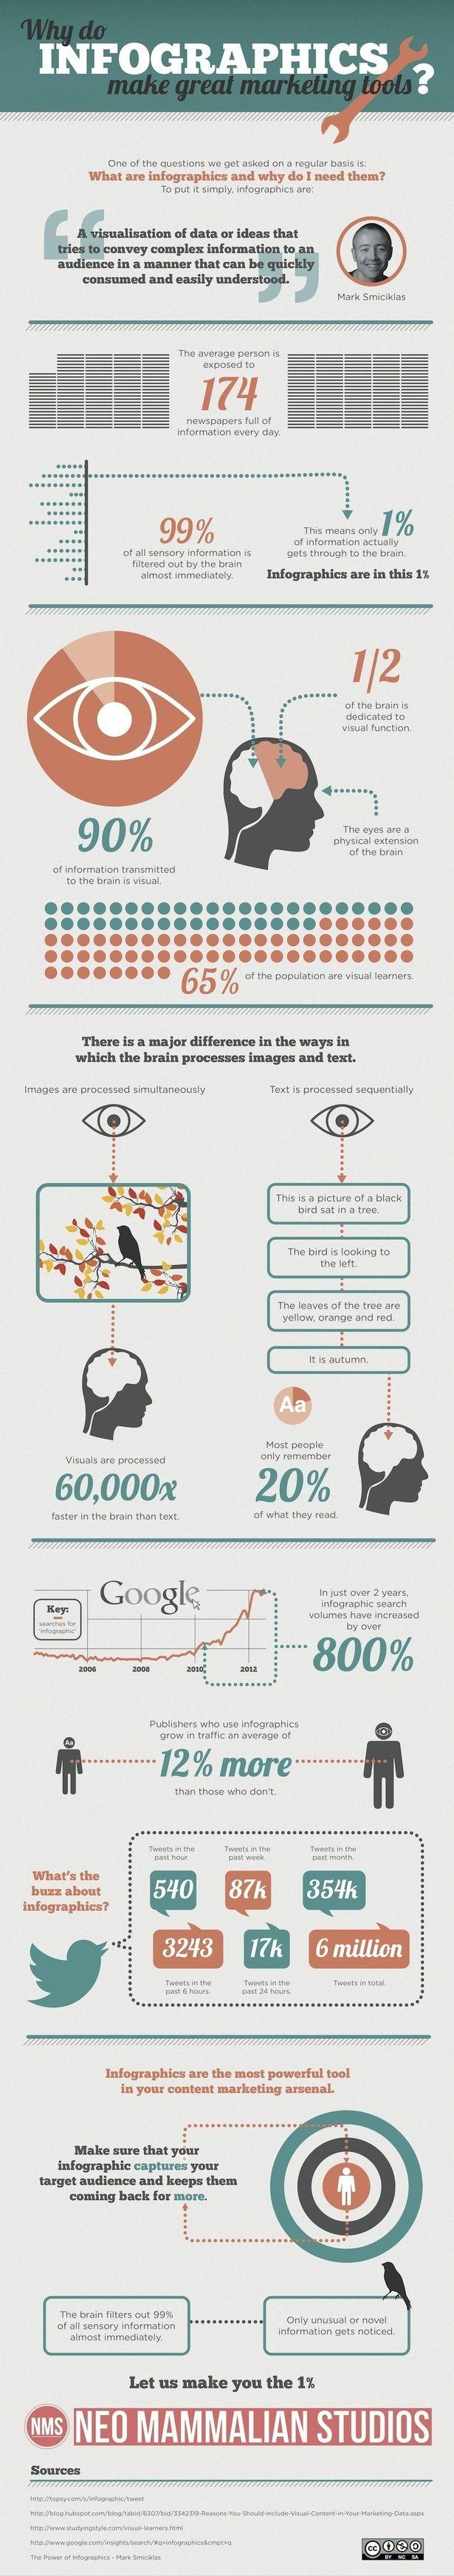 """Why do infographics make great marketing tools?"" (Neo Mammalian Studios) - #Infographic, naturually"